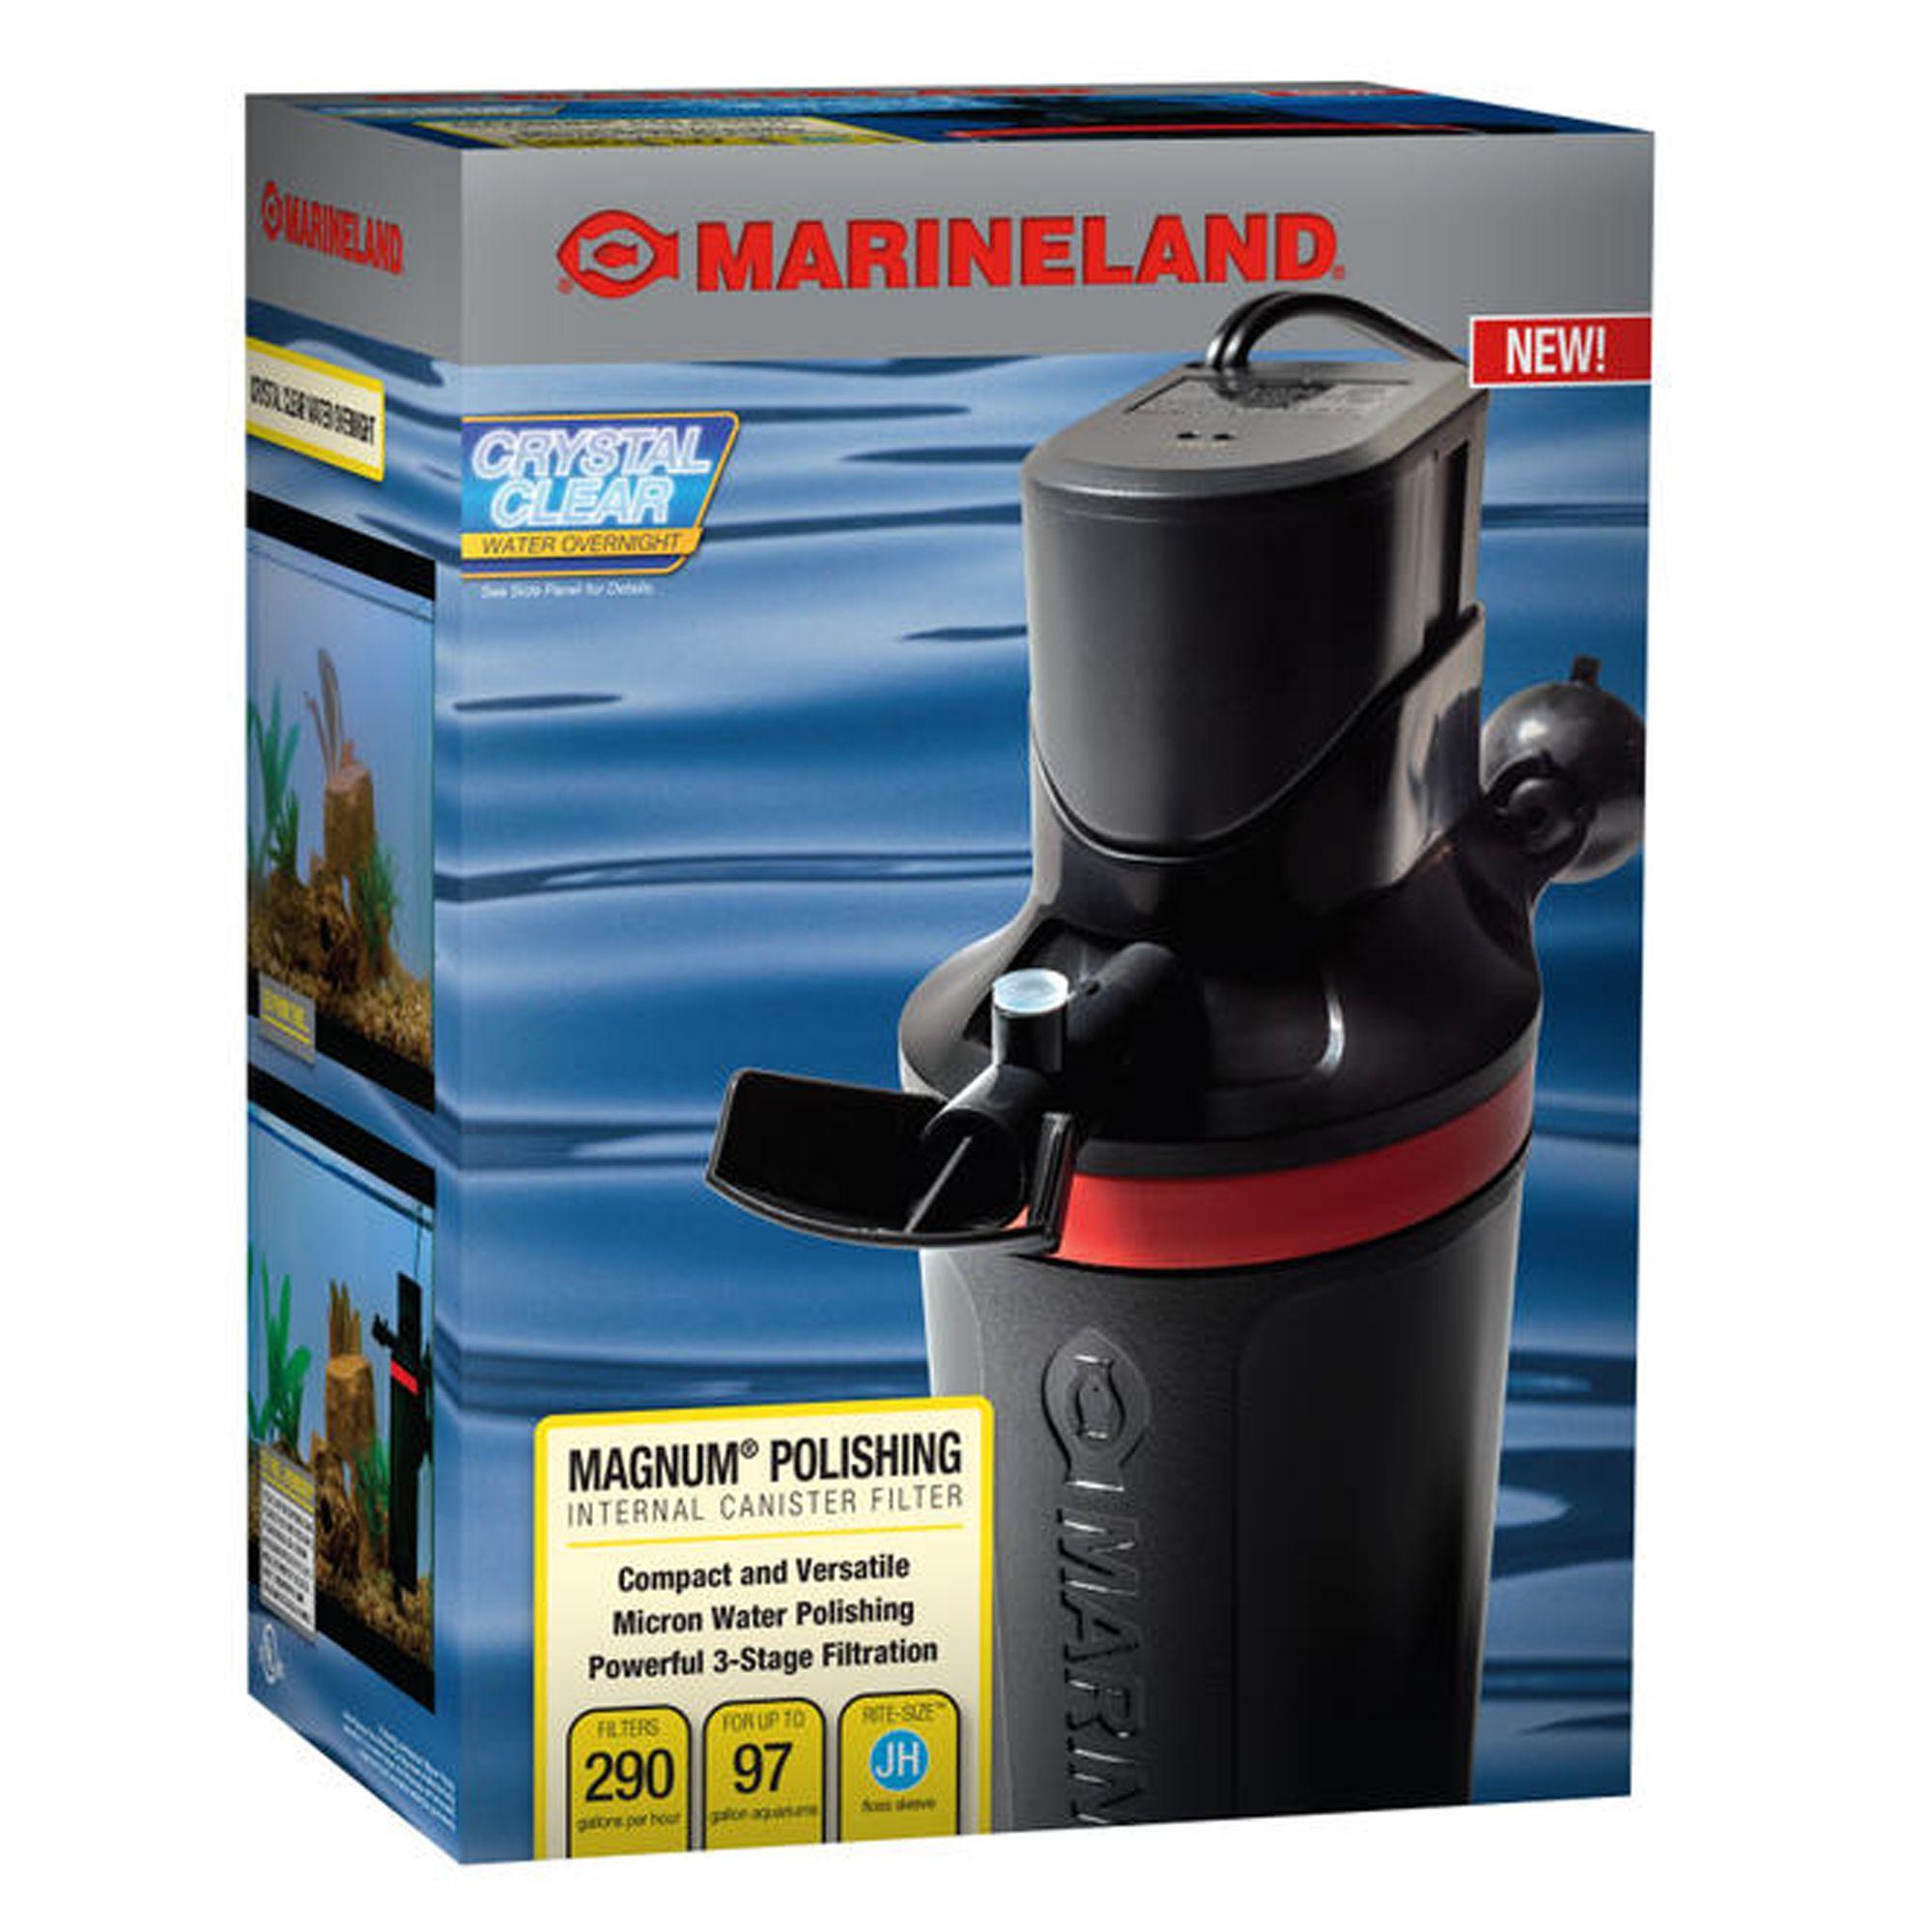 Petsmart Animals Pet Supplies Nano Cartridge Filter Air Water 10 03 U Mikron Marineland Polishing Internal